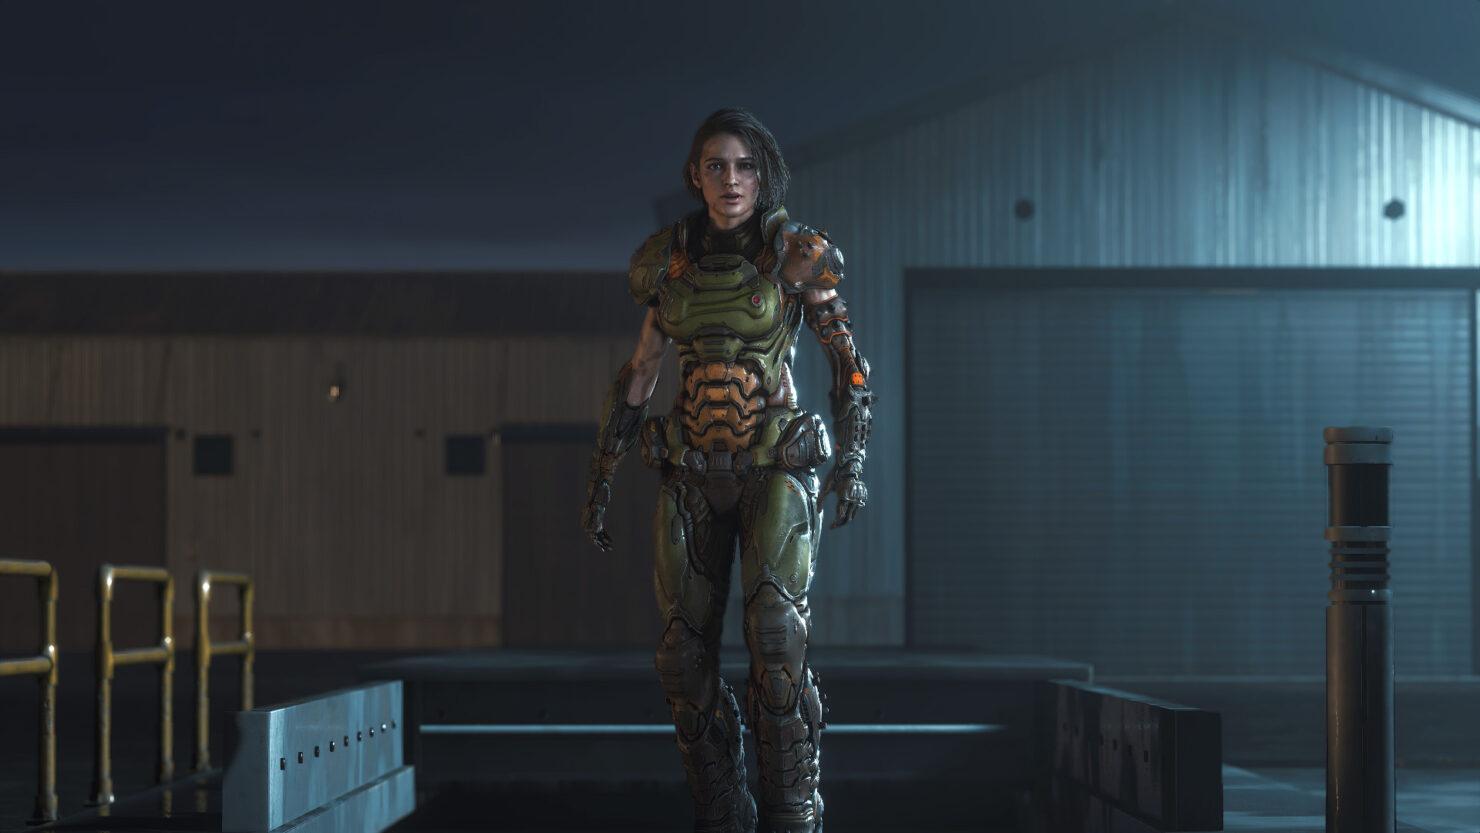 Классный костюм Думслеера для Джилл Валентайн из Resident Evil 3